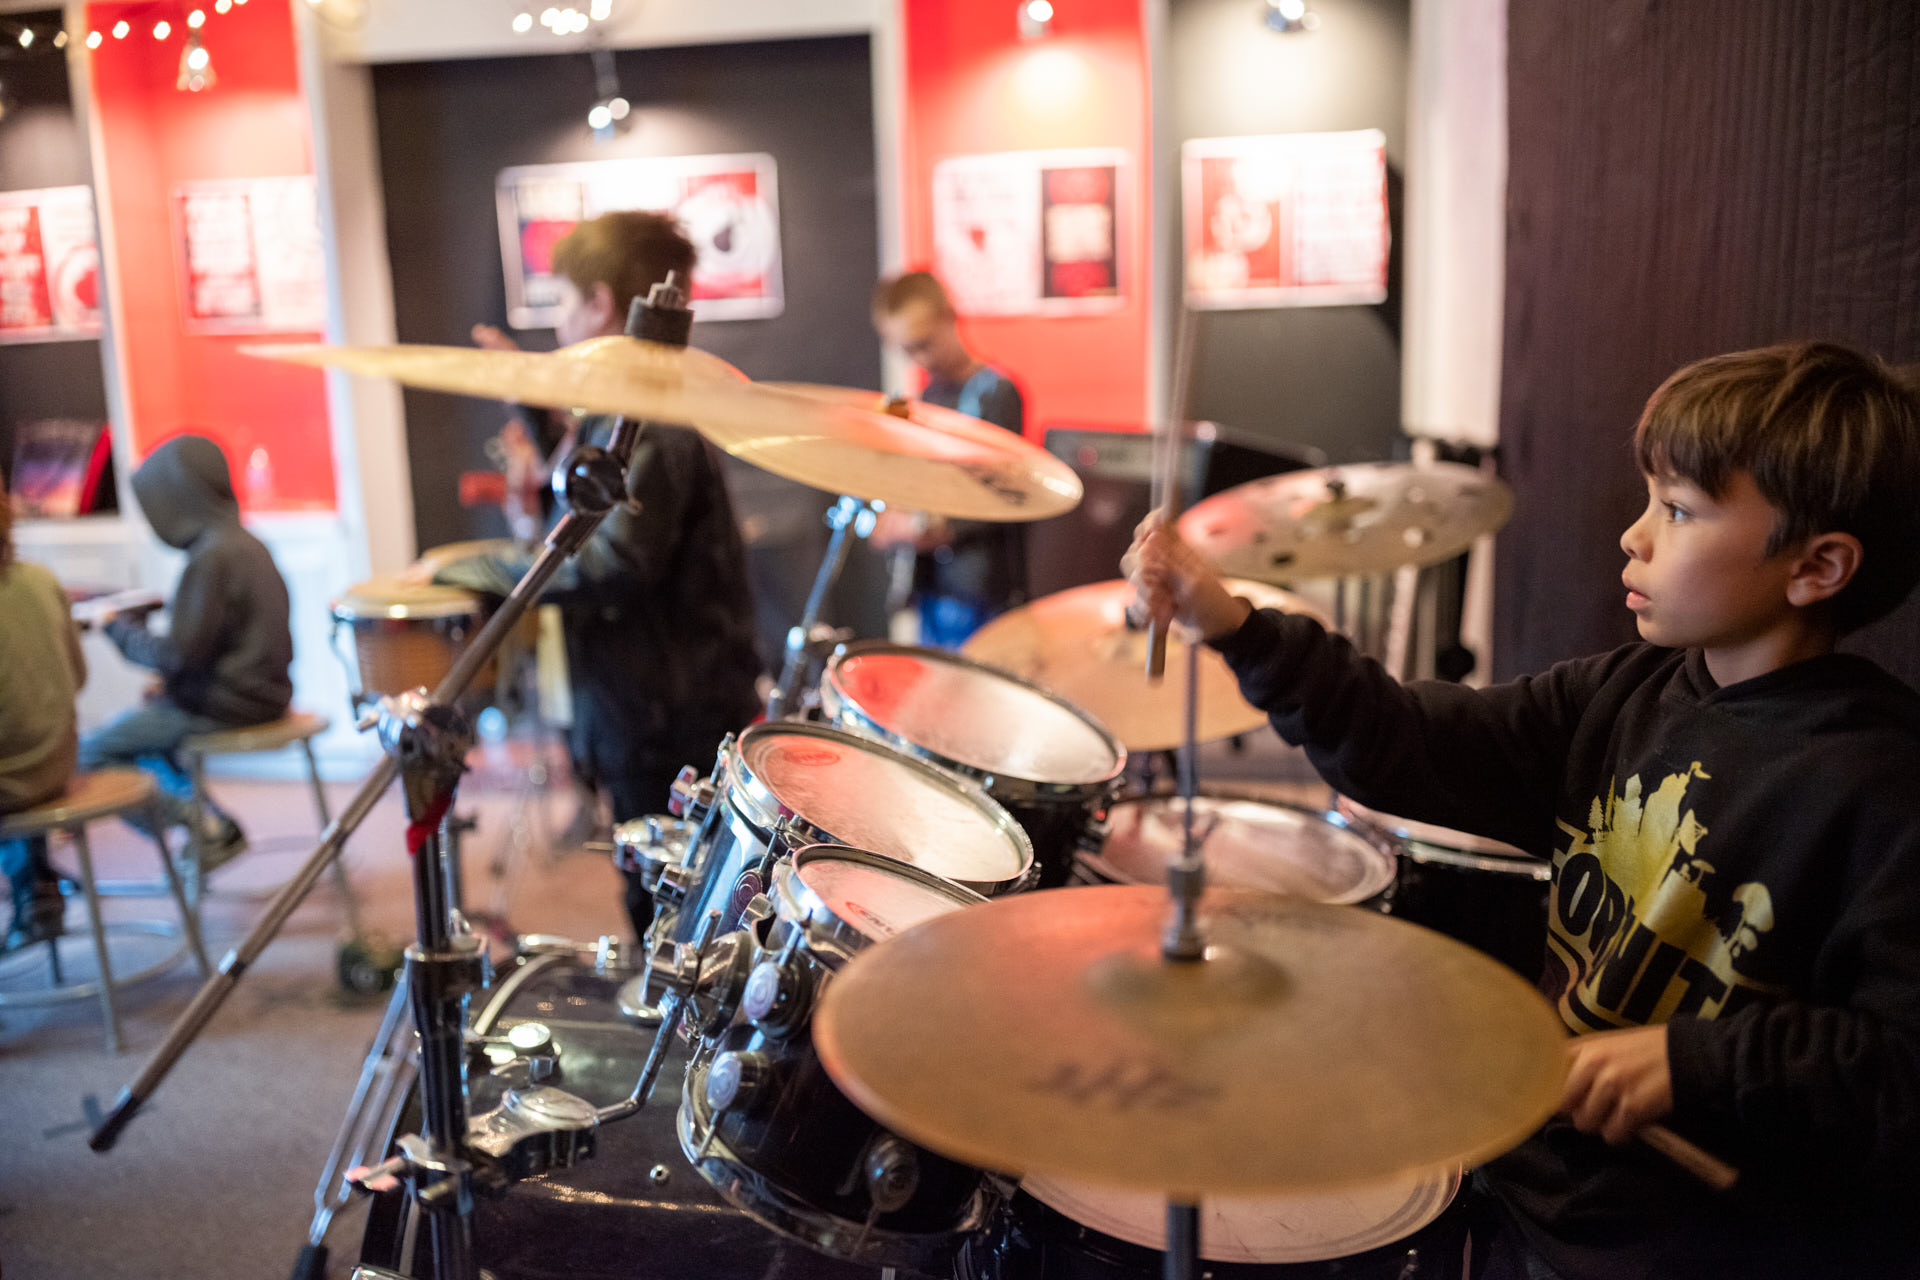 school-of-rock-teaches-the-universal-language-of-music-6